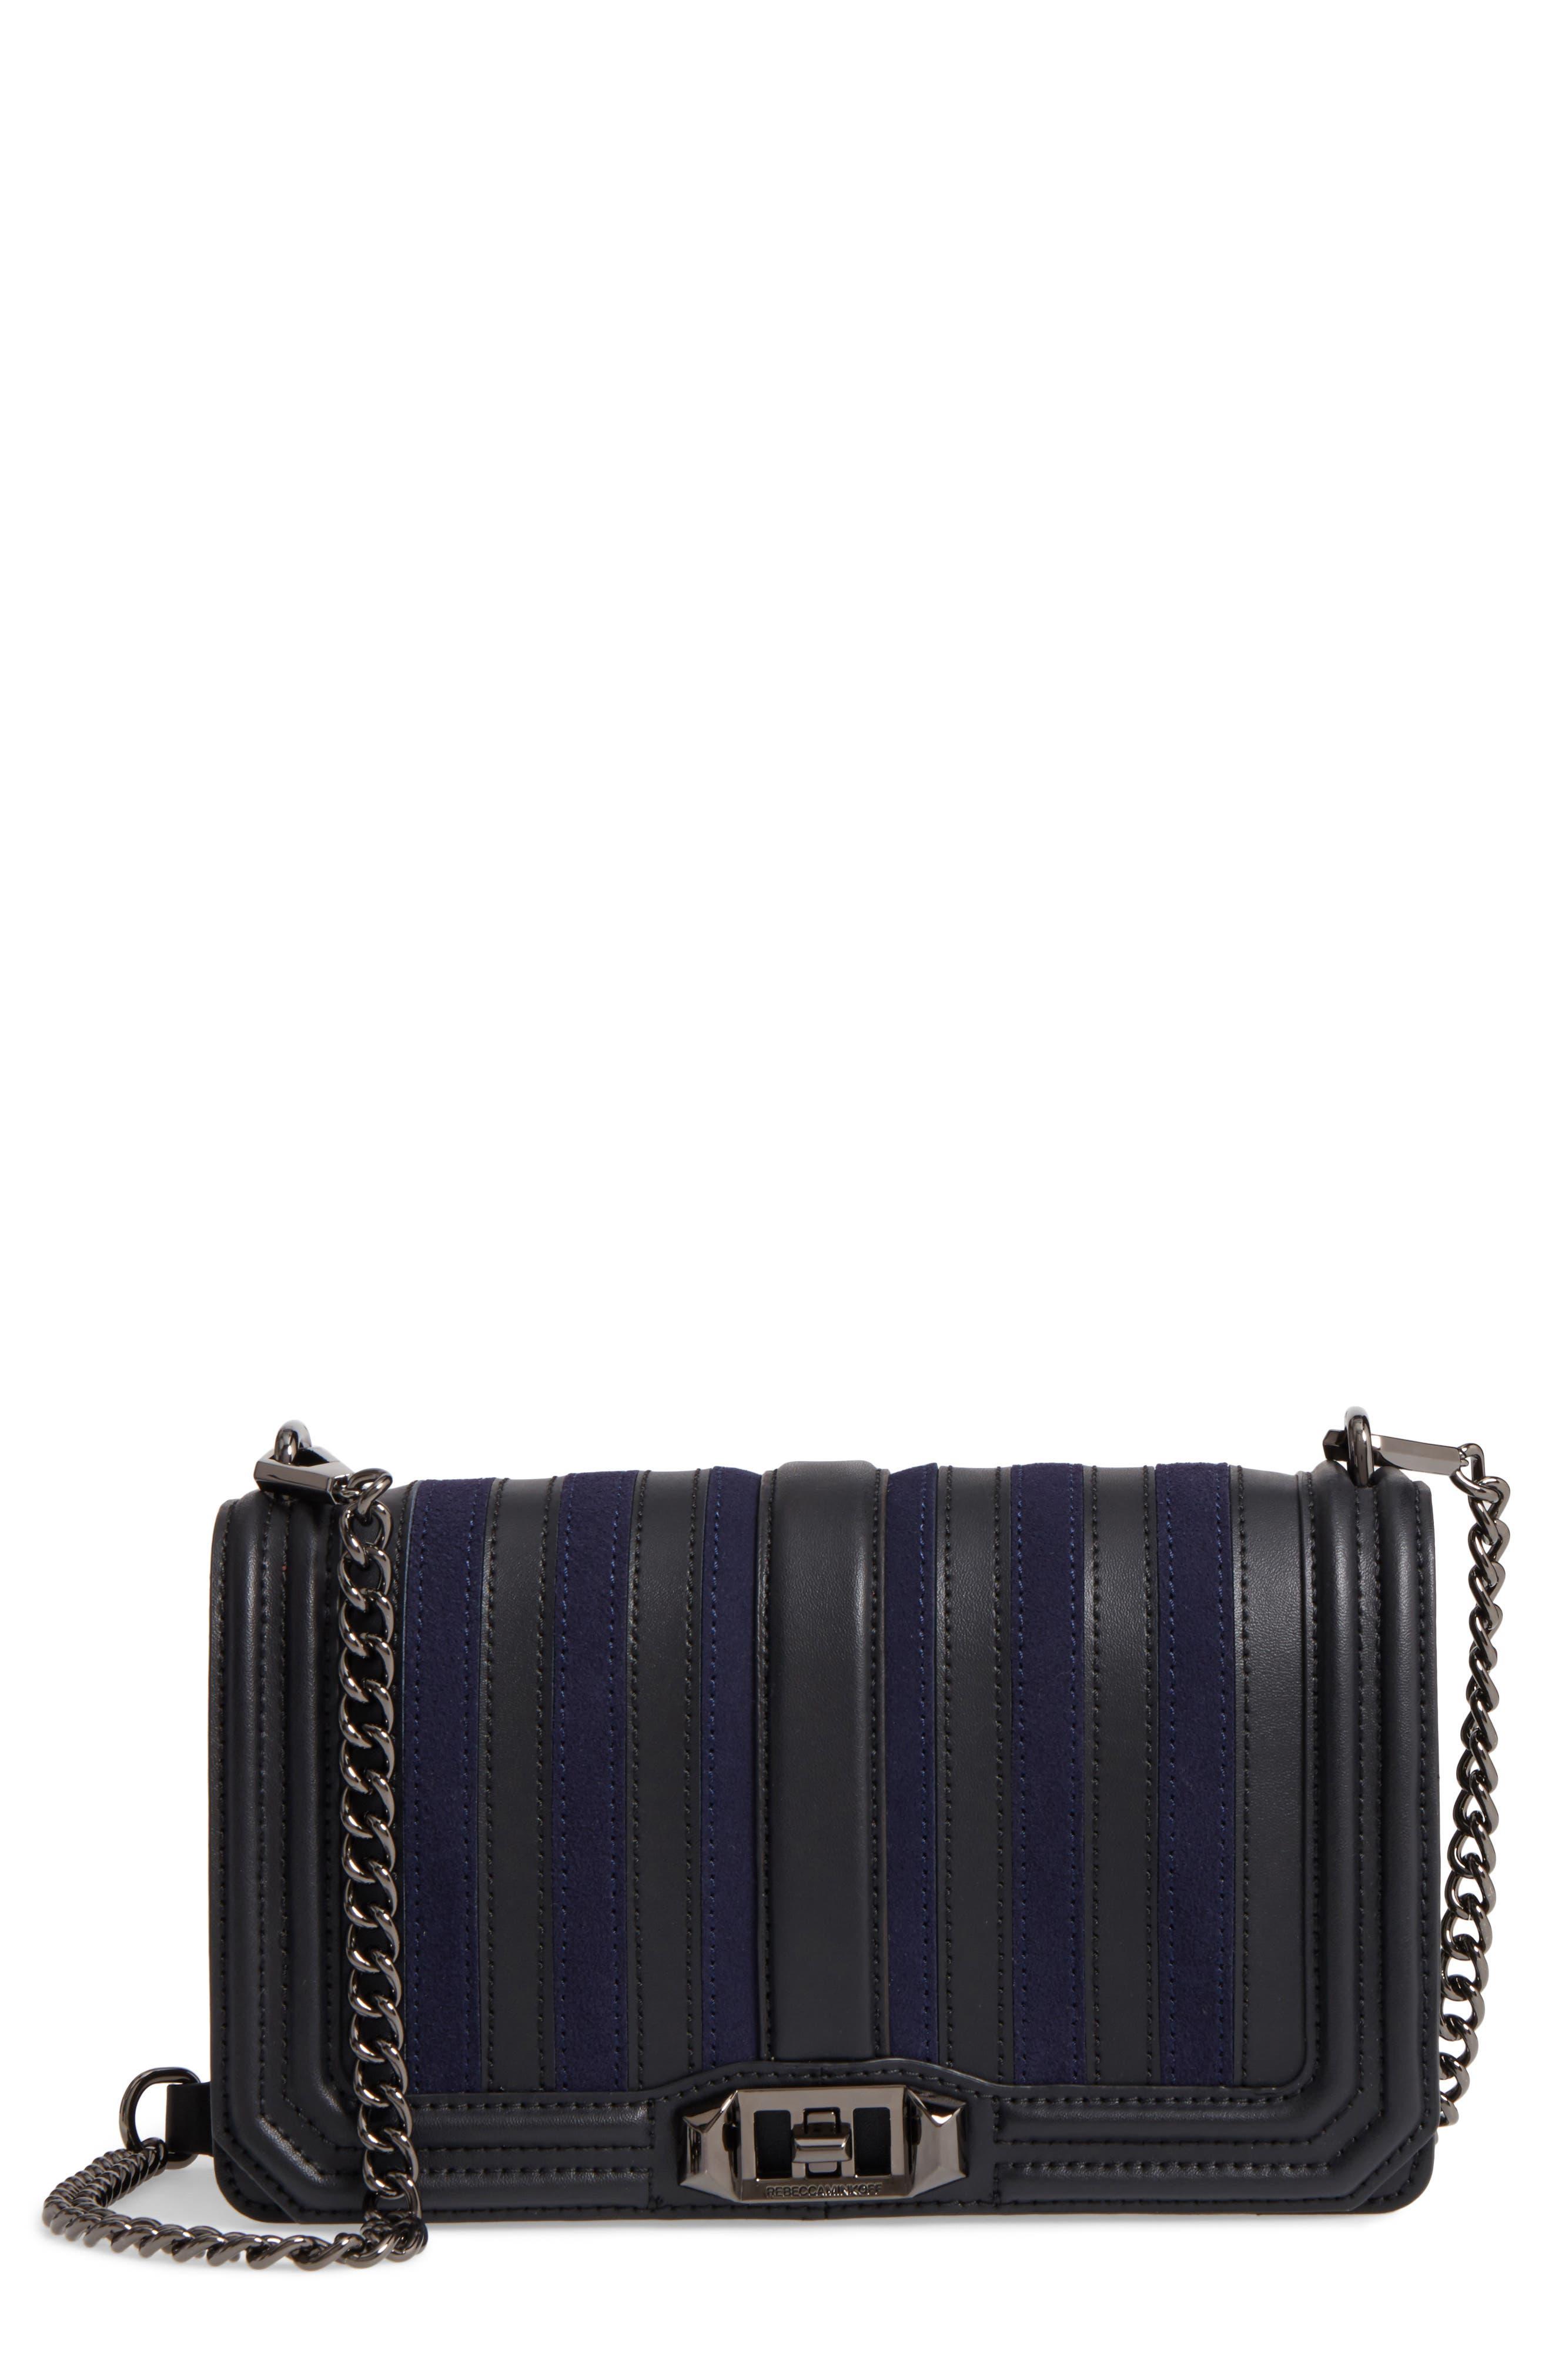 REBECCA MINKOFF Love Stripe Quilted Crossbody Bag